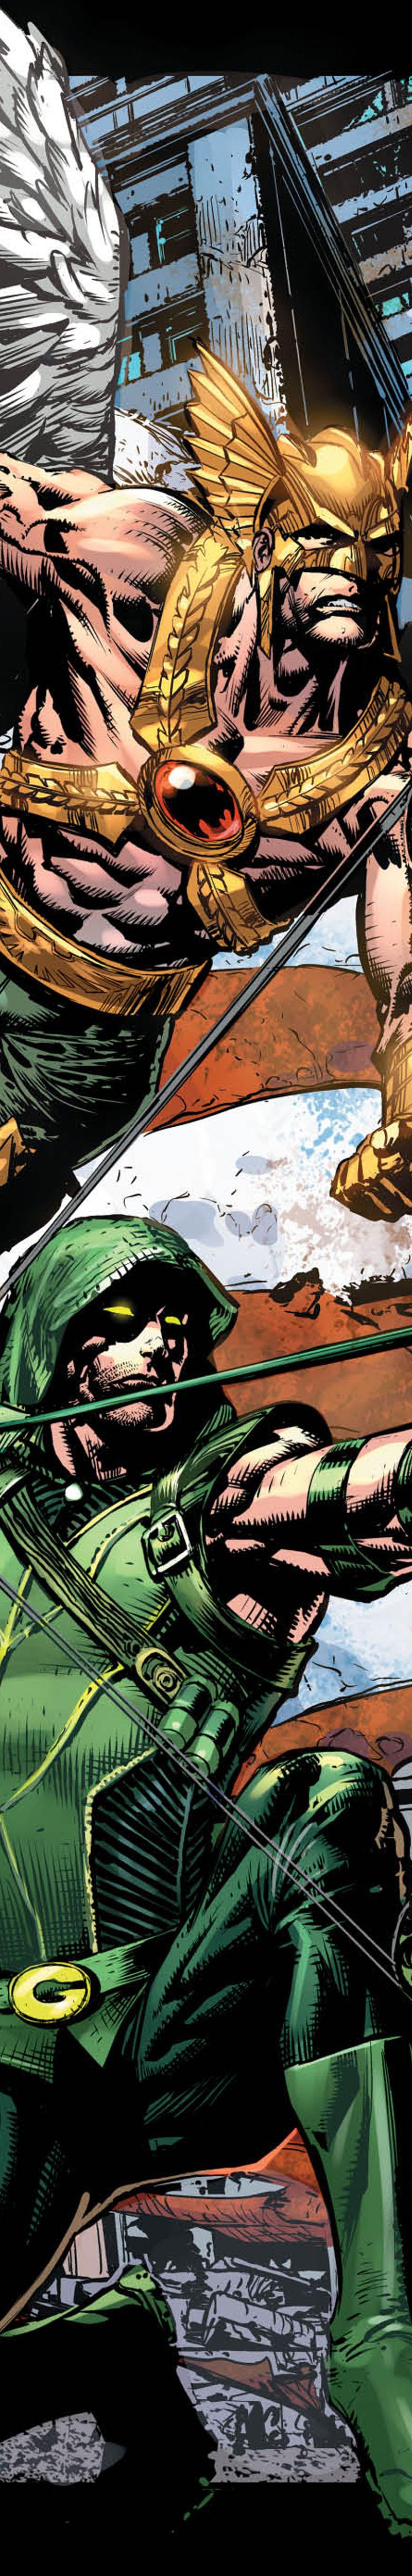 Hawkman & Green Arrow